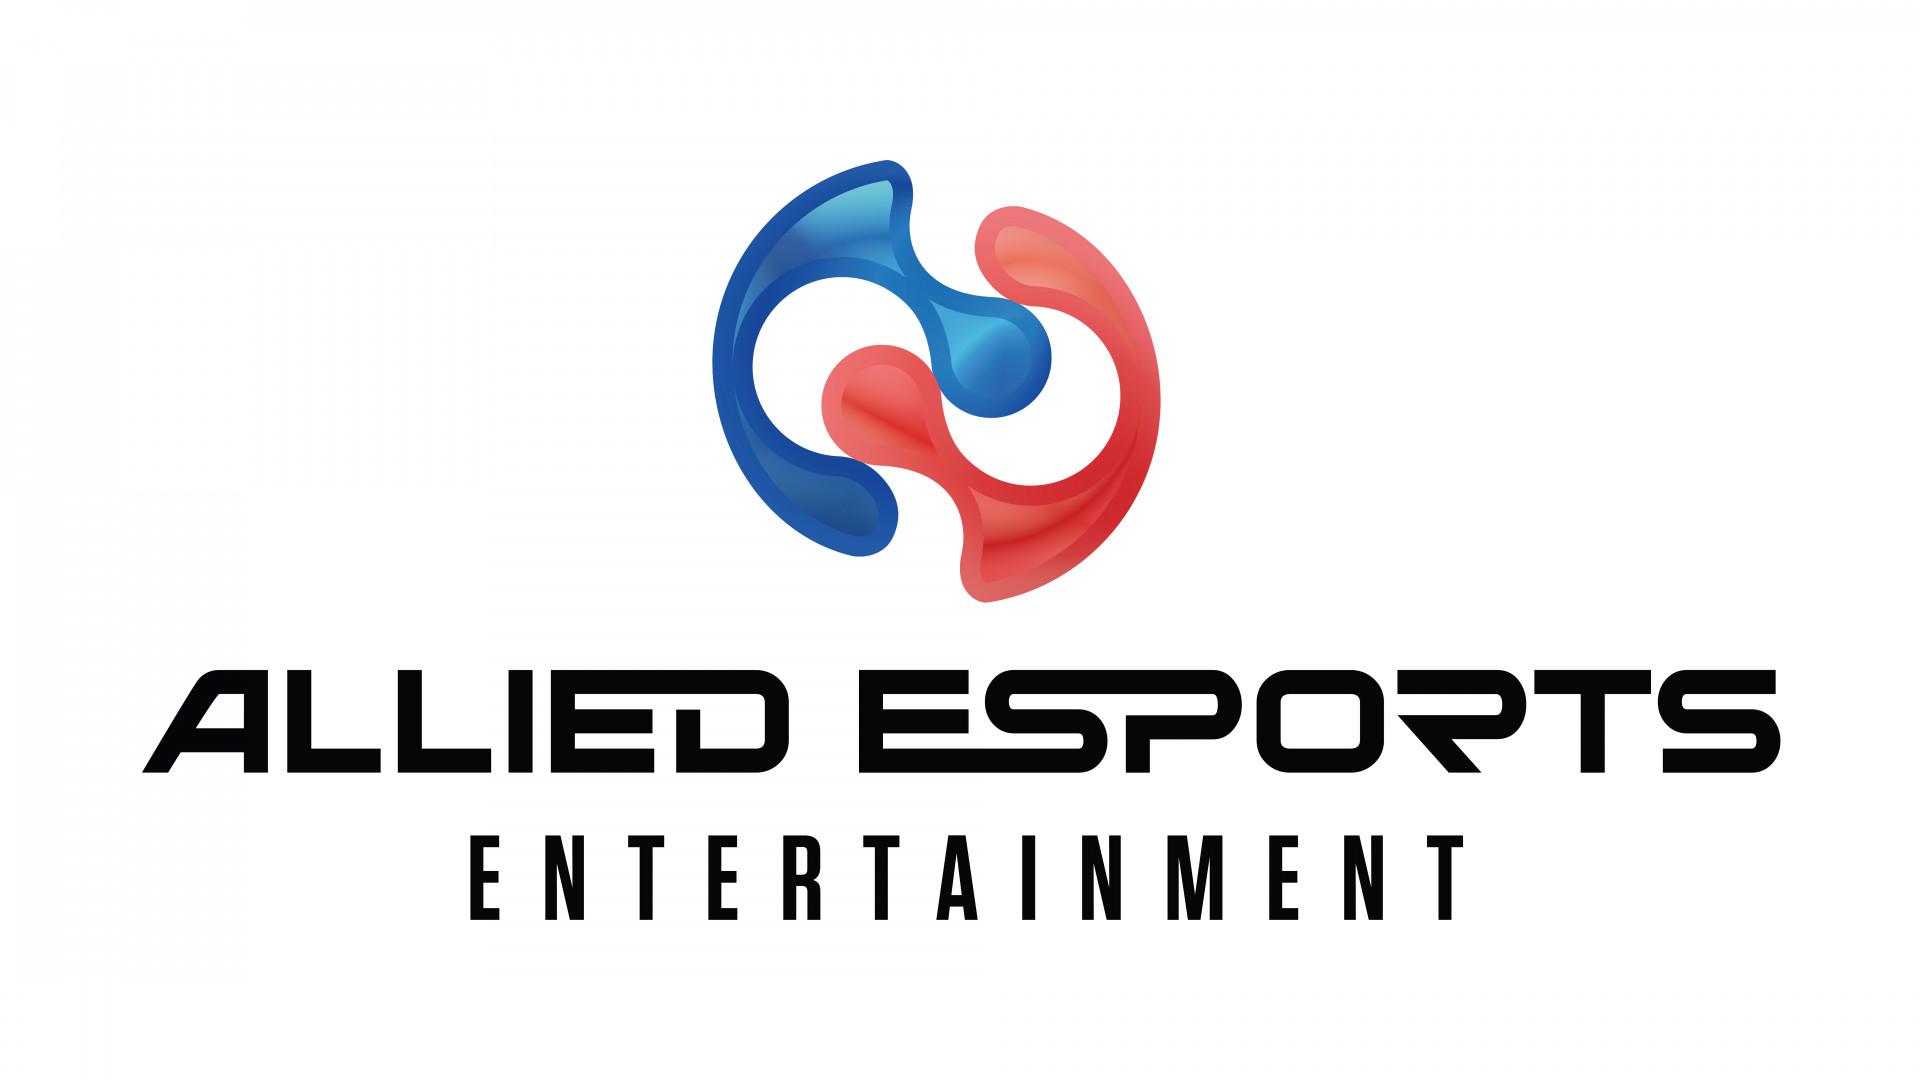 Allied Esports x Roy Anderson